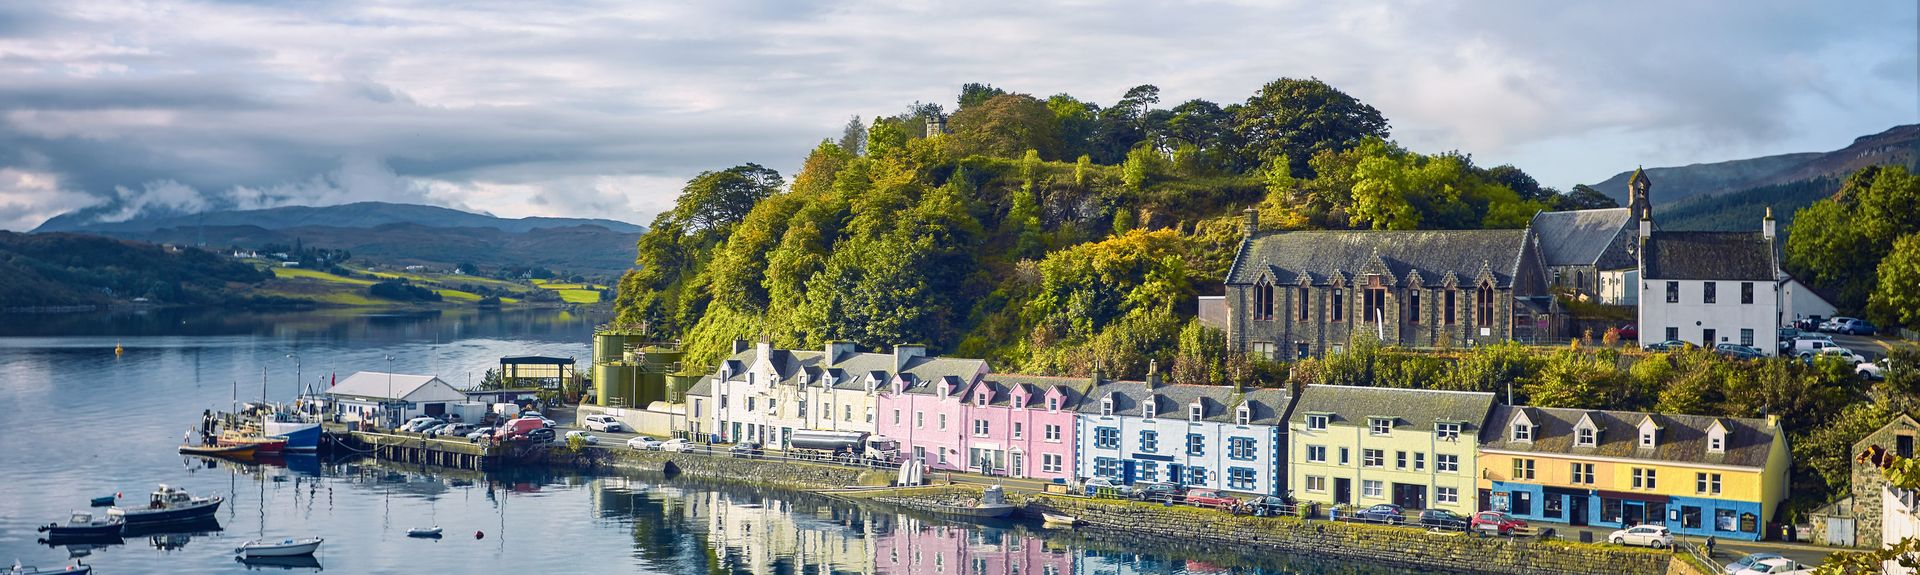 Isle of Skye, Schottland, Großbritannien